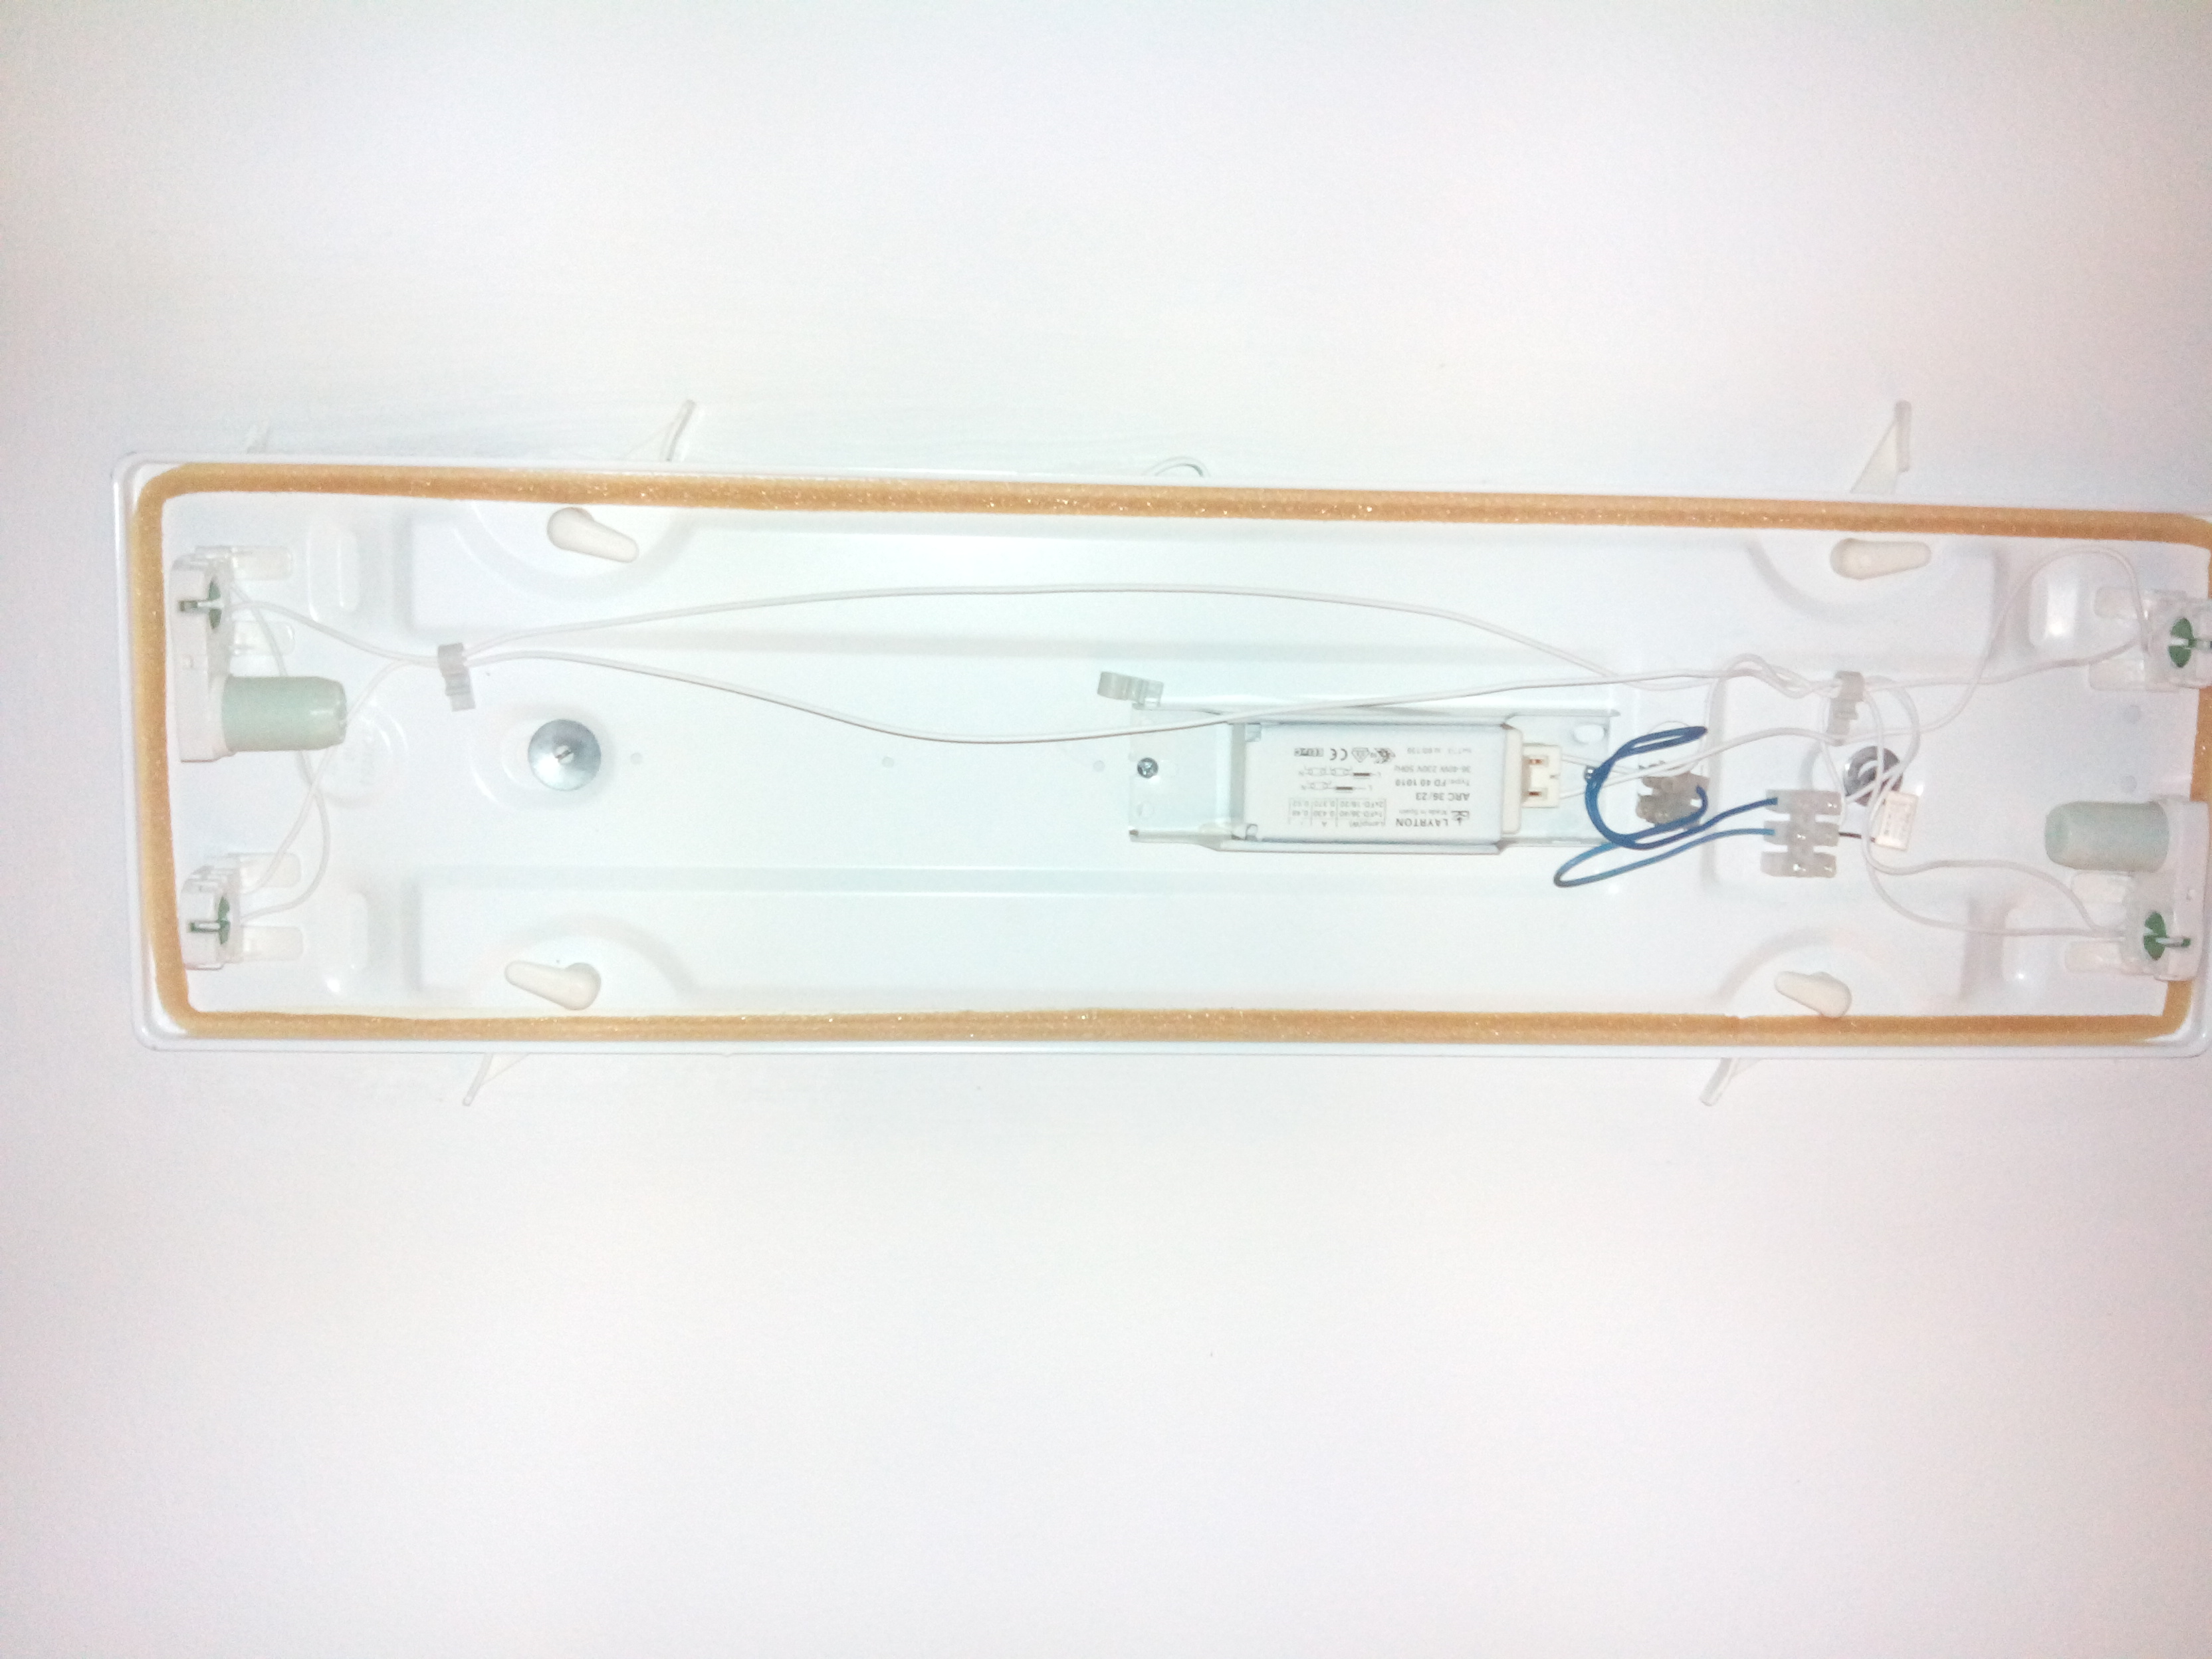 Solucionado cambiar tubos led en pantalla 2 tubos yoreparo for Sustituir tubo fluorescente por led